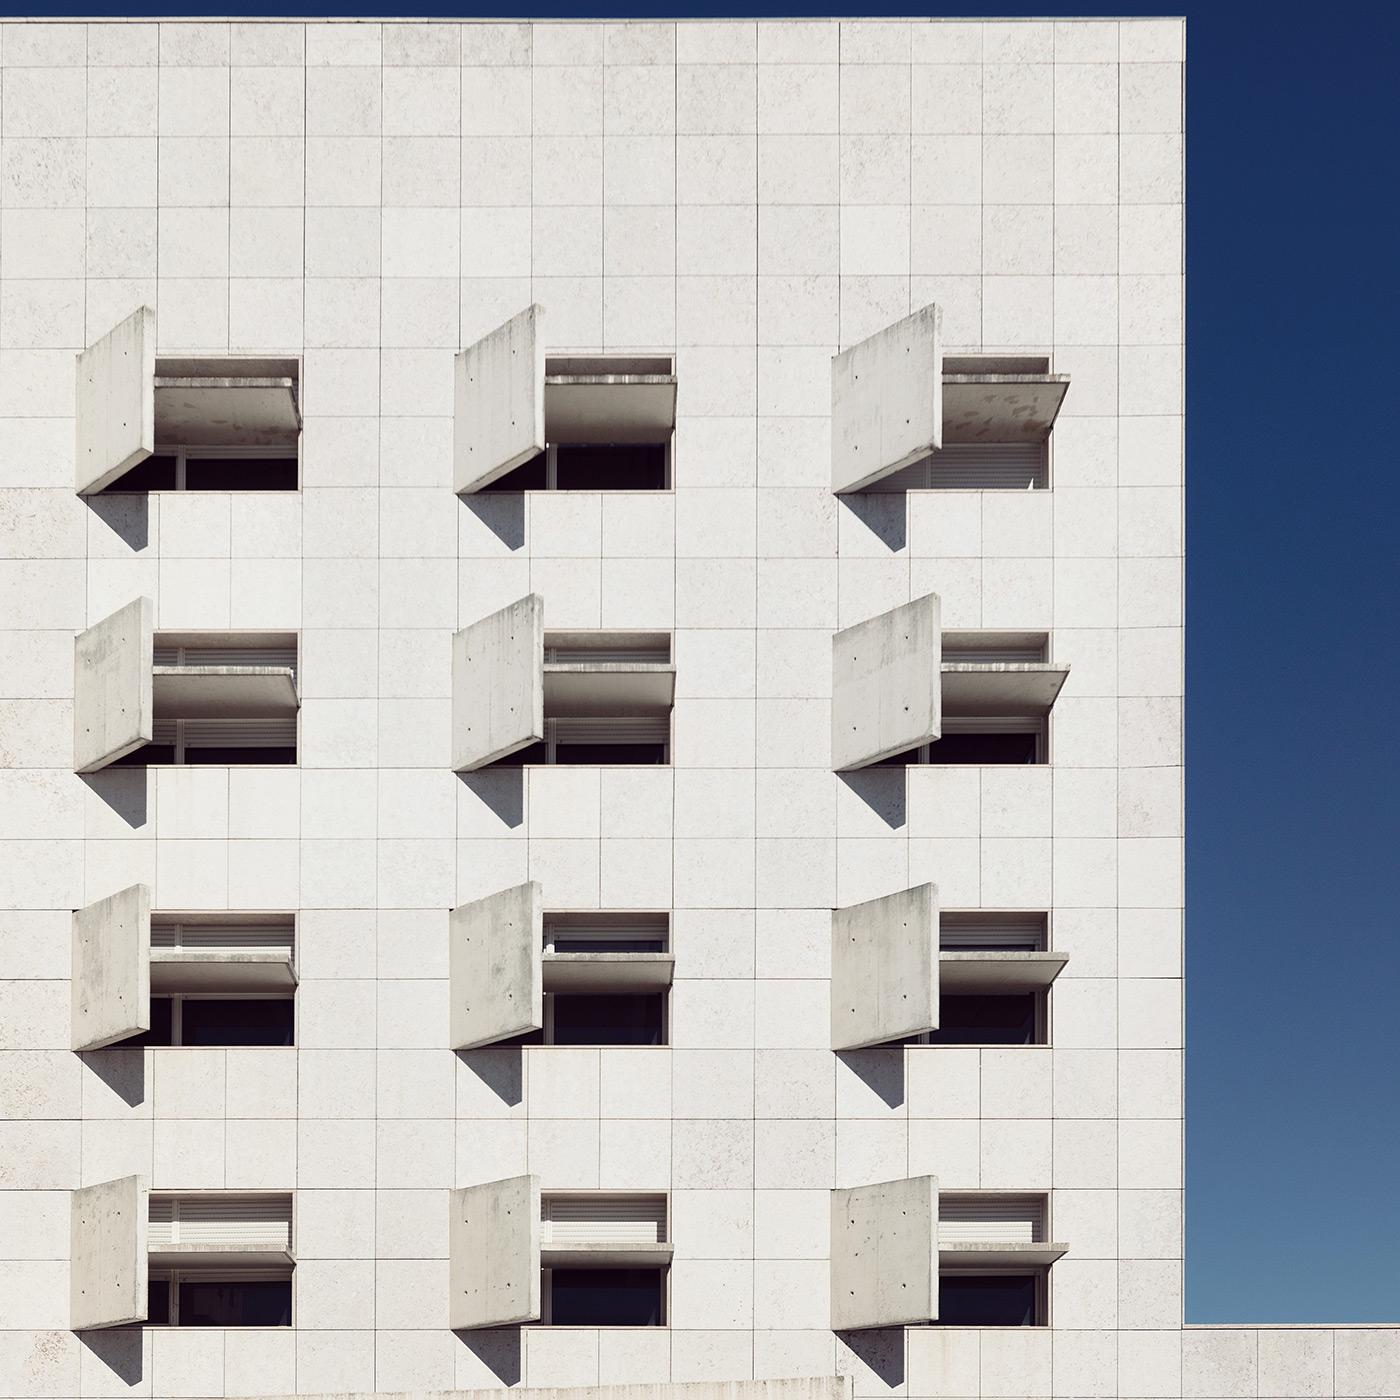 ISCTE University Institute of Lisbon . Location: Lisbon, Portugal . Architect: Raúl Hestnes Ferreira